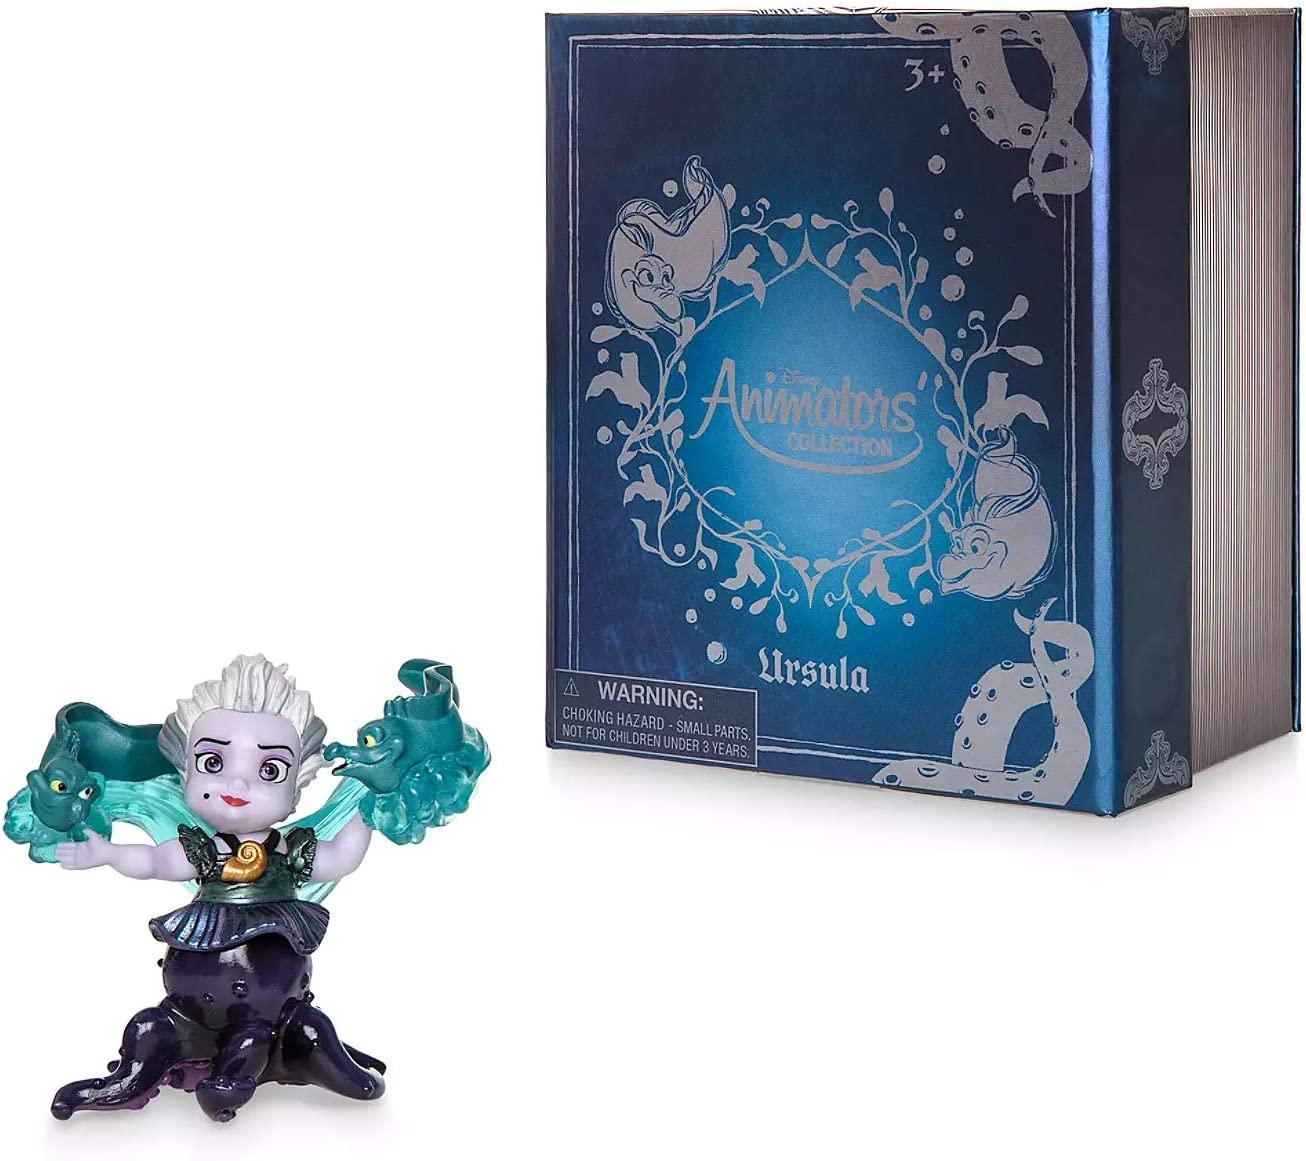 Amazon Com Le Disney Animators Collection Ursula Vinyl Figure The Little Mermaid 3 Toys Games